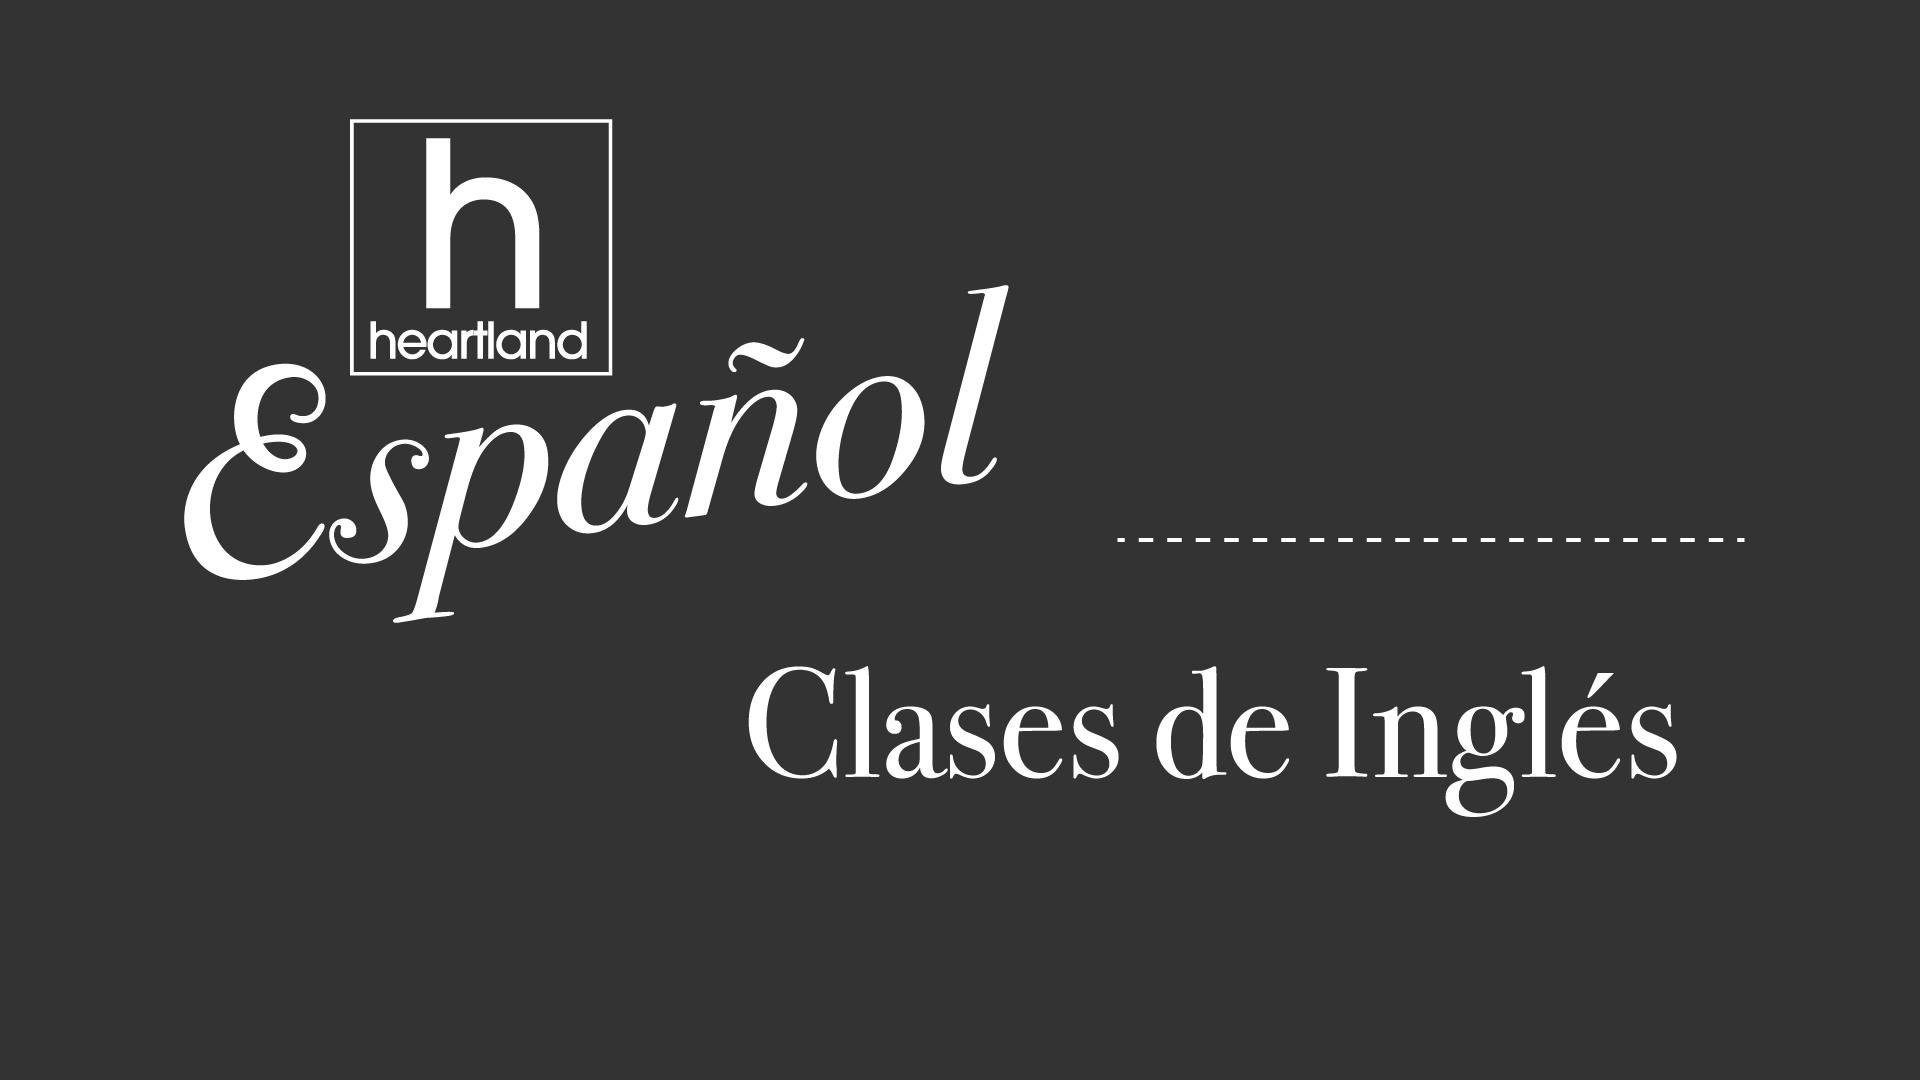 Español - Clases de Inglés